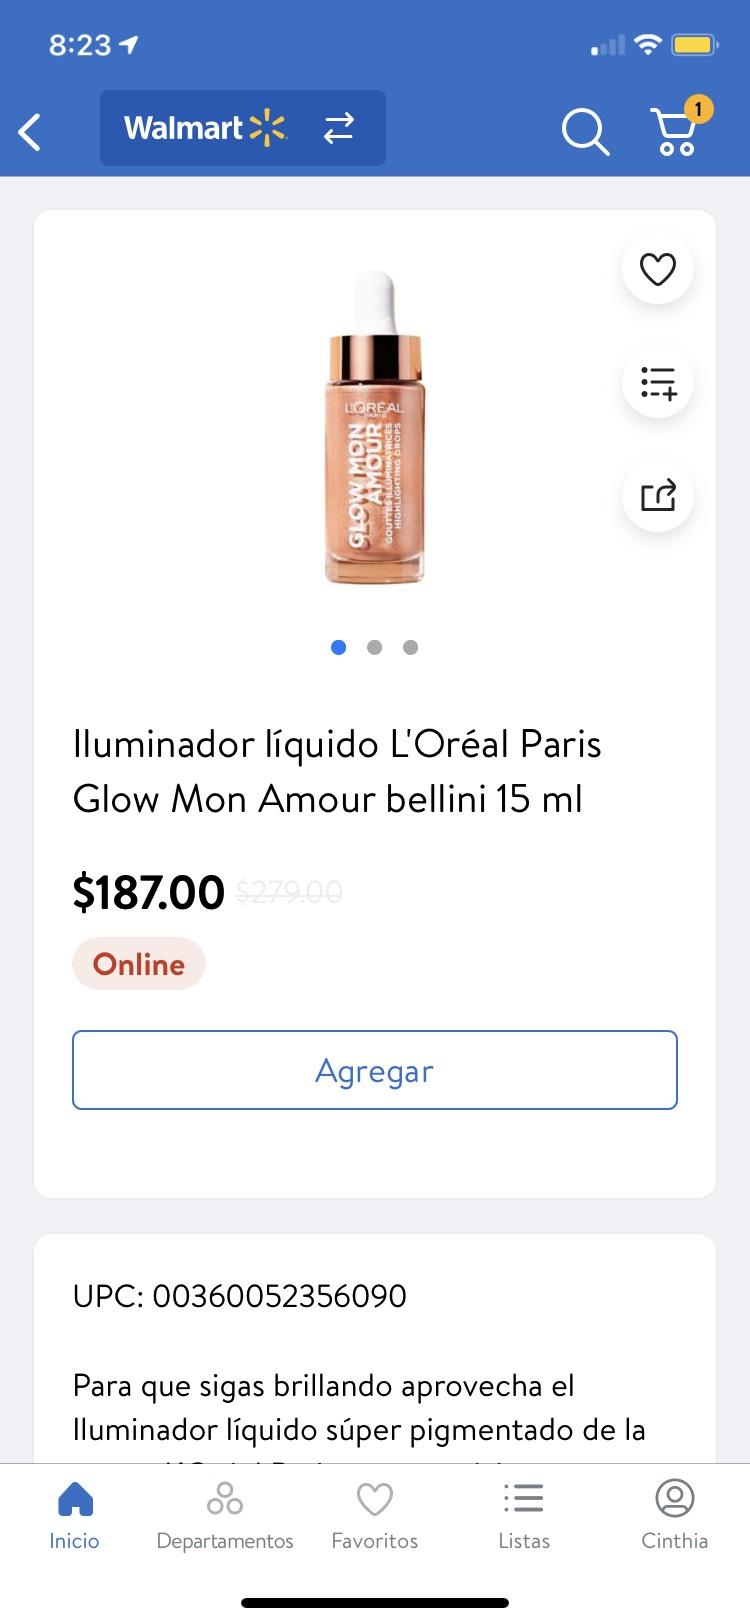 Walmart: Iluminadores L'Oréal